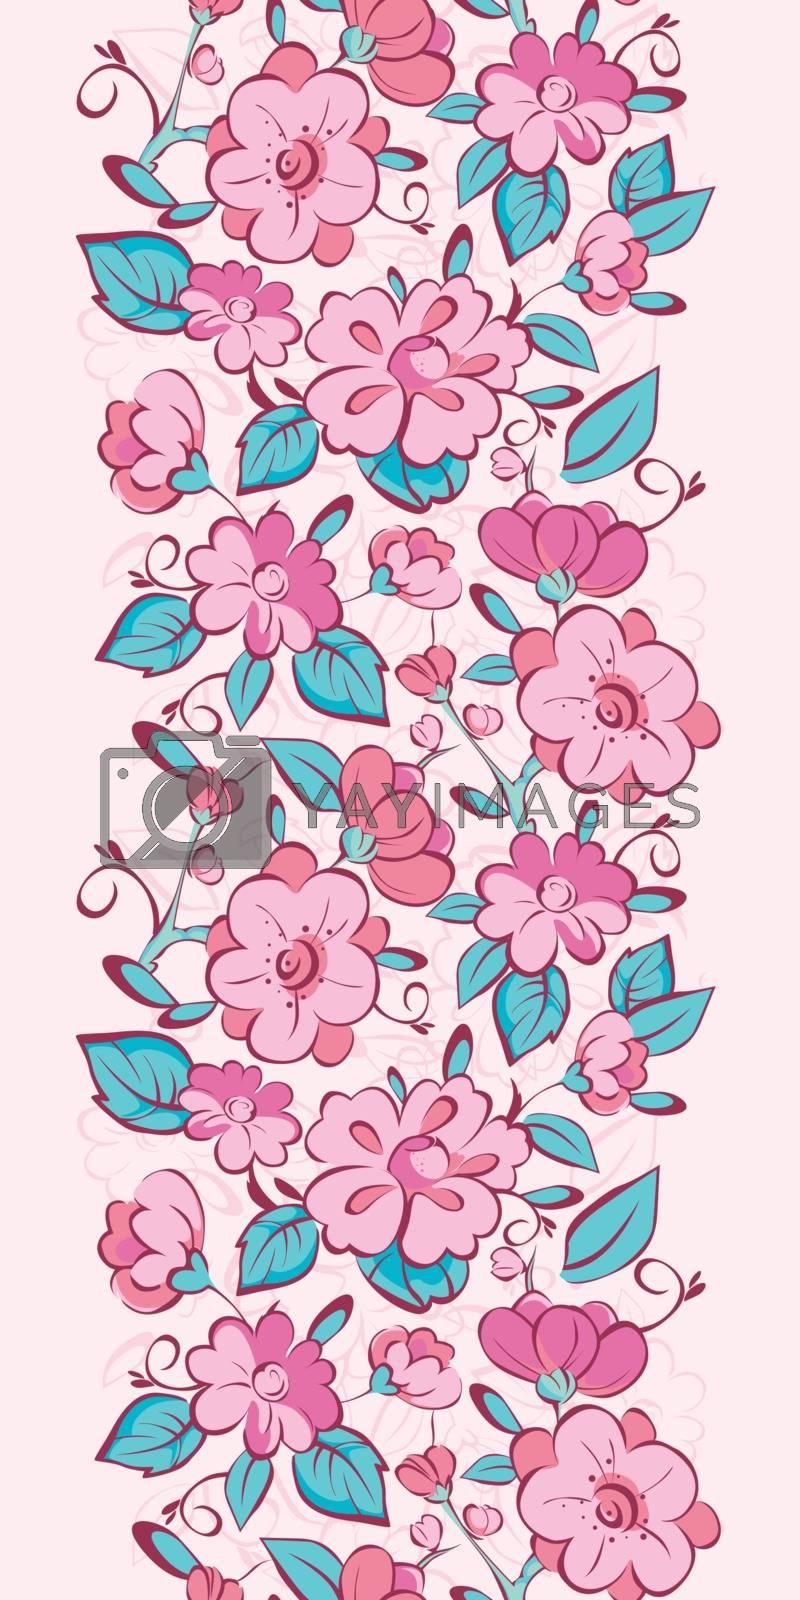 Vector pink blue kimono flowers vertical border seamless pattern background graphic design